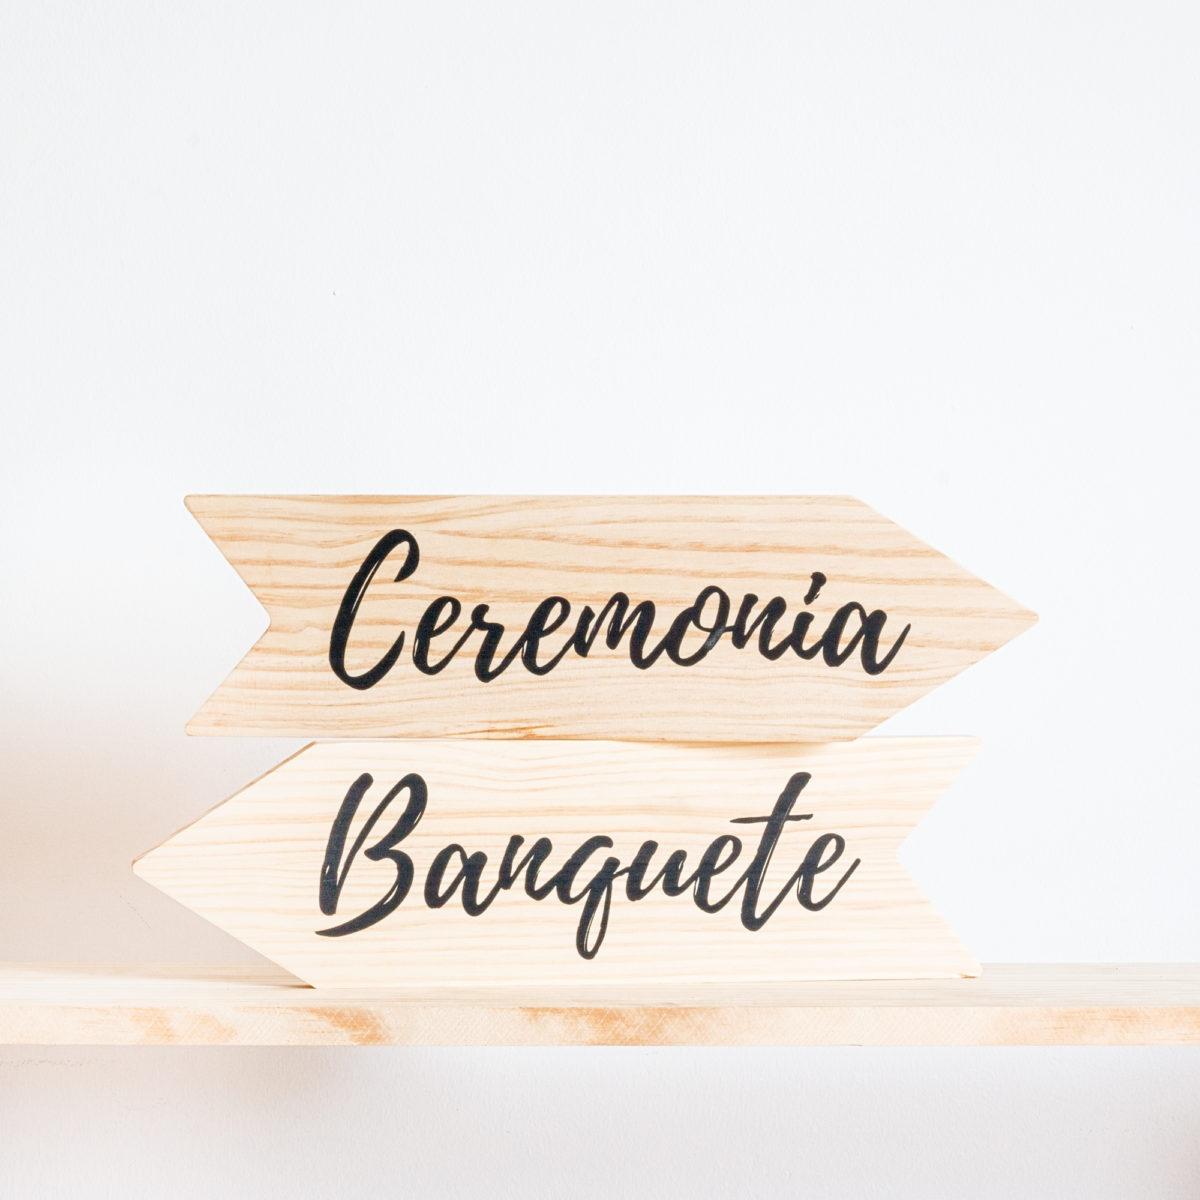 Cartel Flecha (Ceremonia, Baile o Banquete)